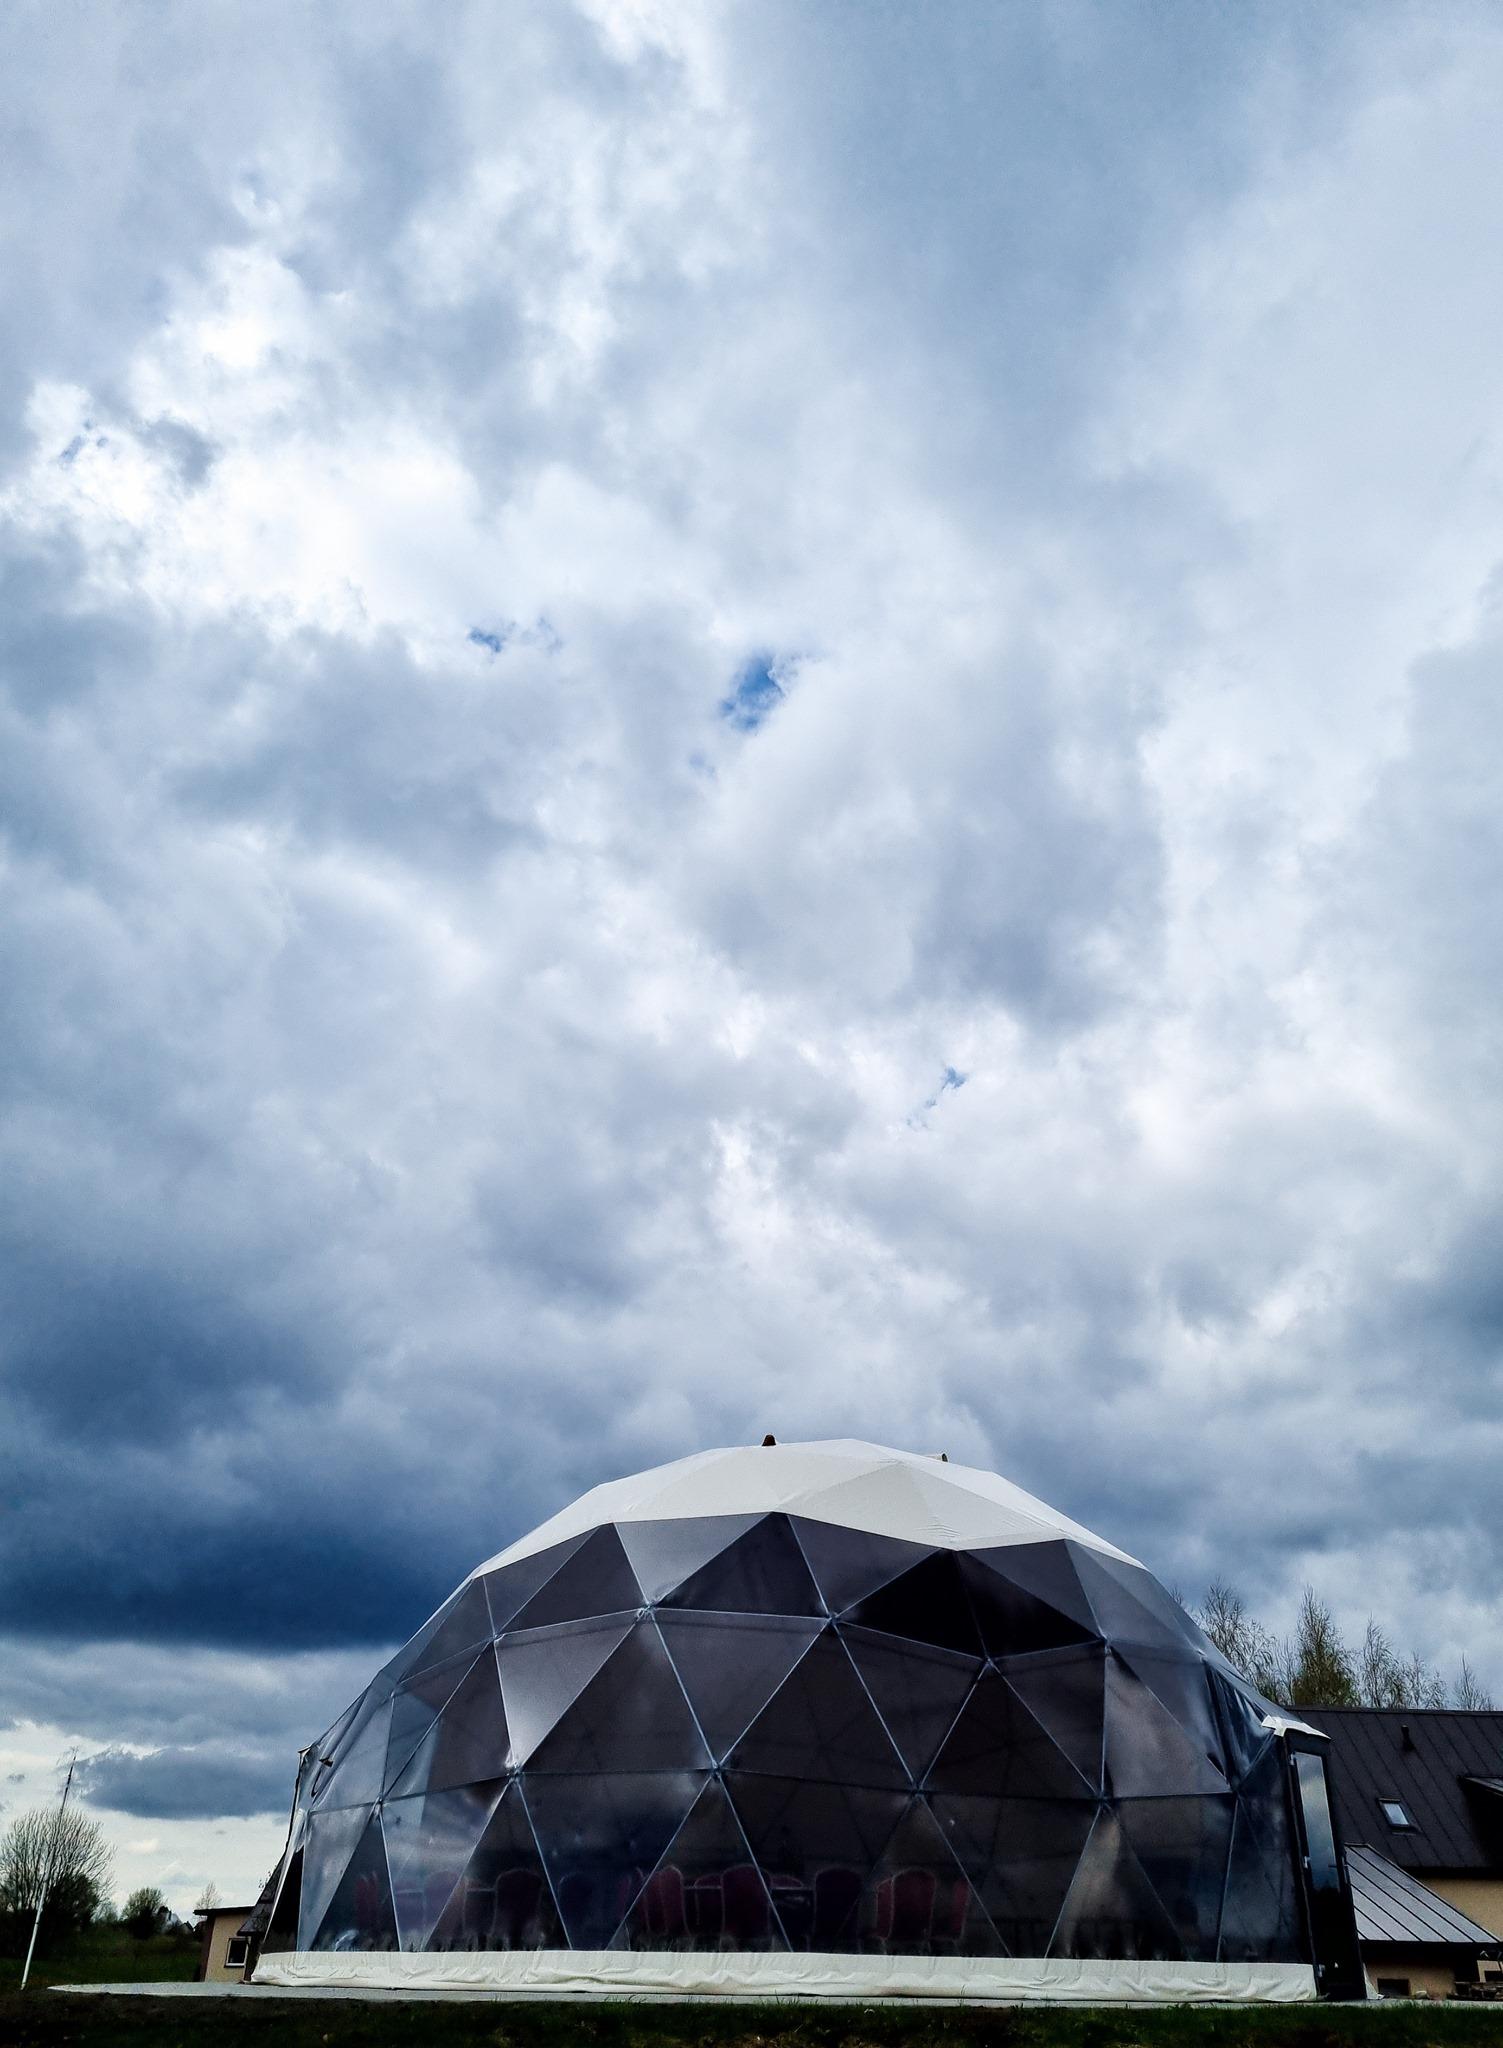 95м2 Ø11м Купол для свадебных мероприятий   MEDA HOUSE, LT